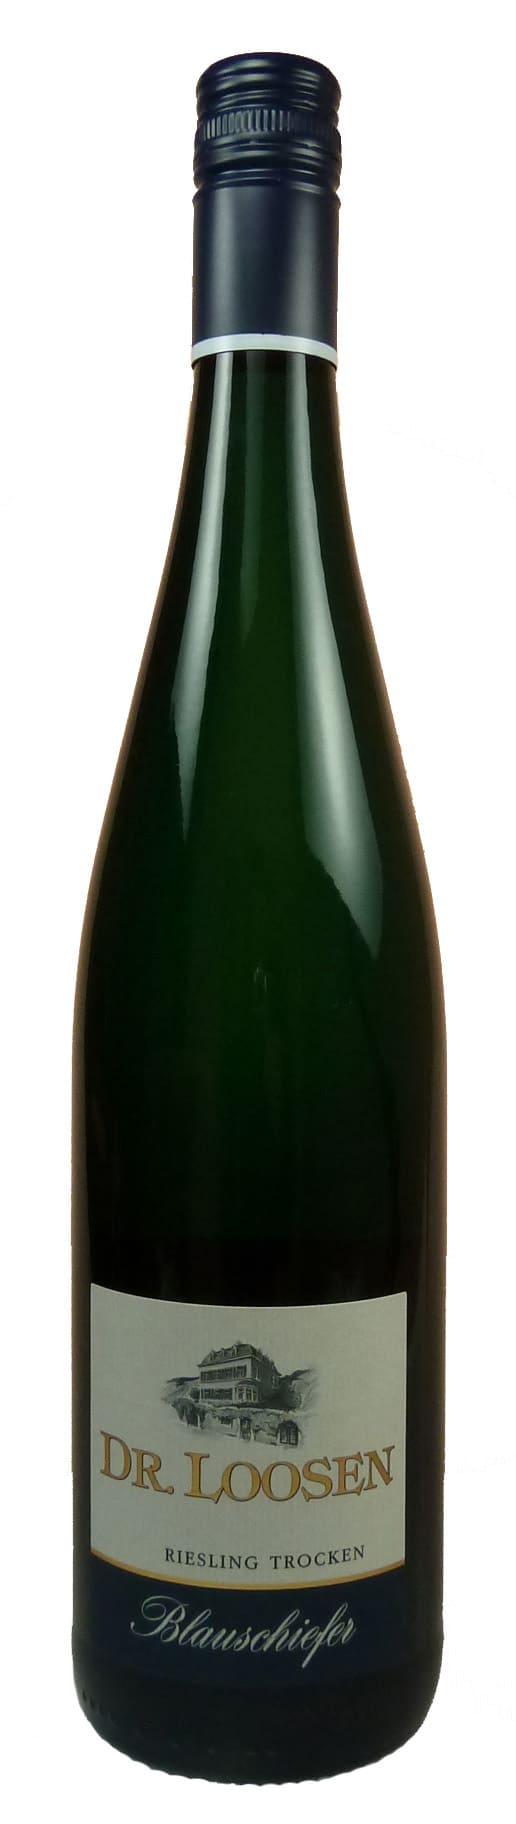 Blauschiefer Riesling Qualitätswein trocken 2016